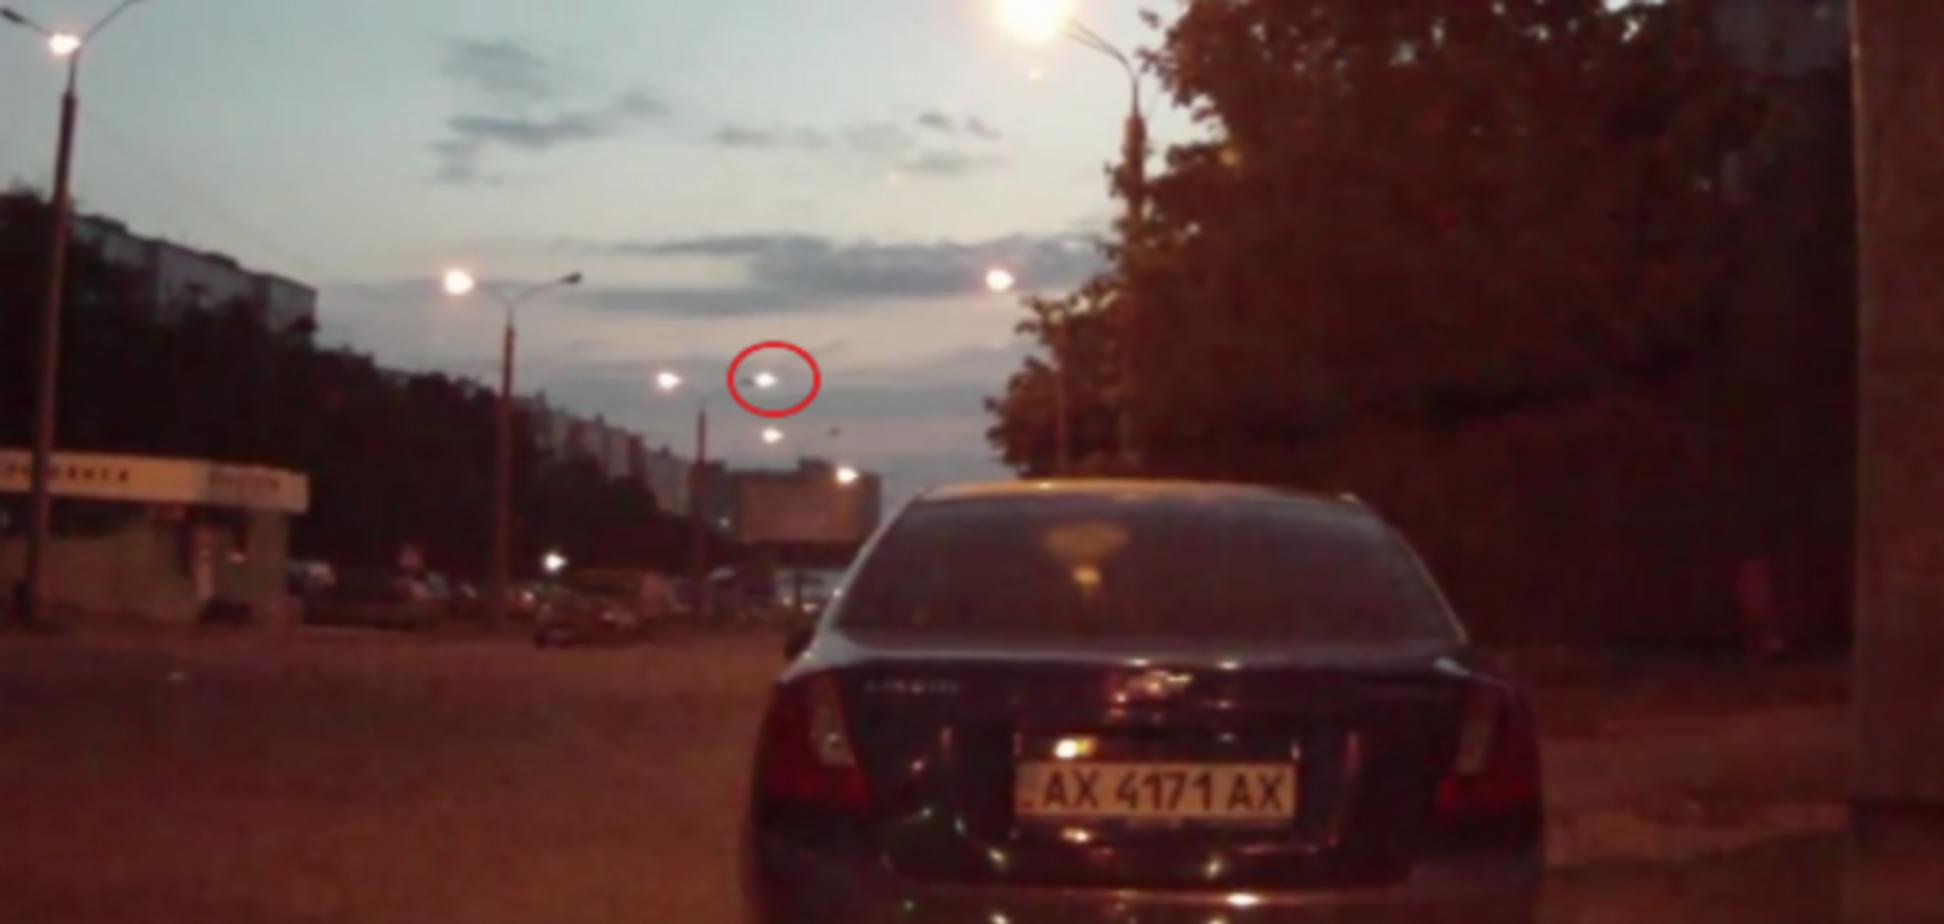 В Харькове в ночном небе засняли НЛО: видеофакт